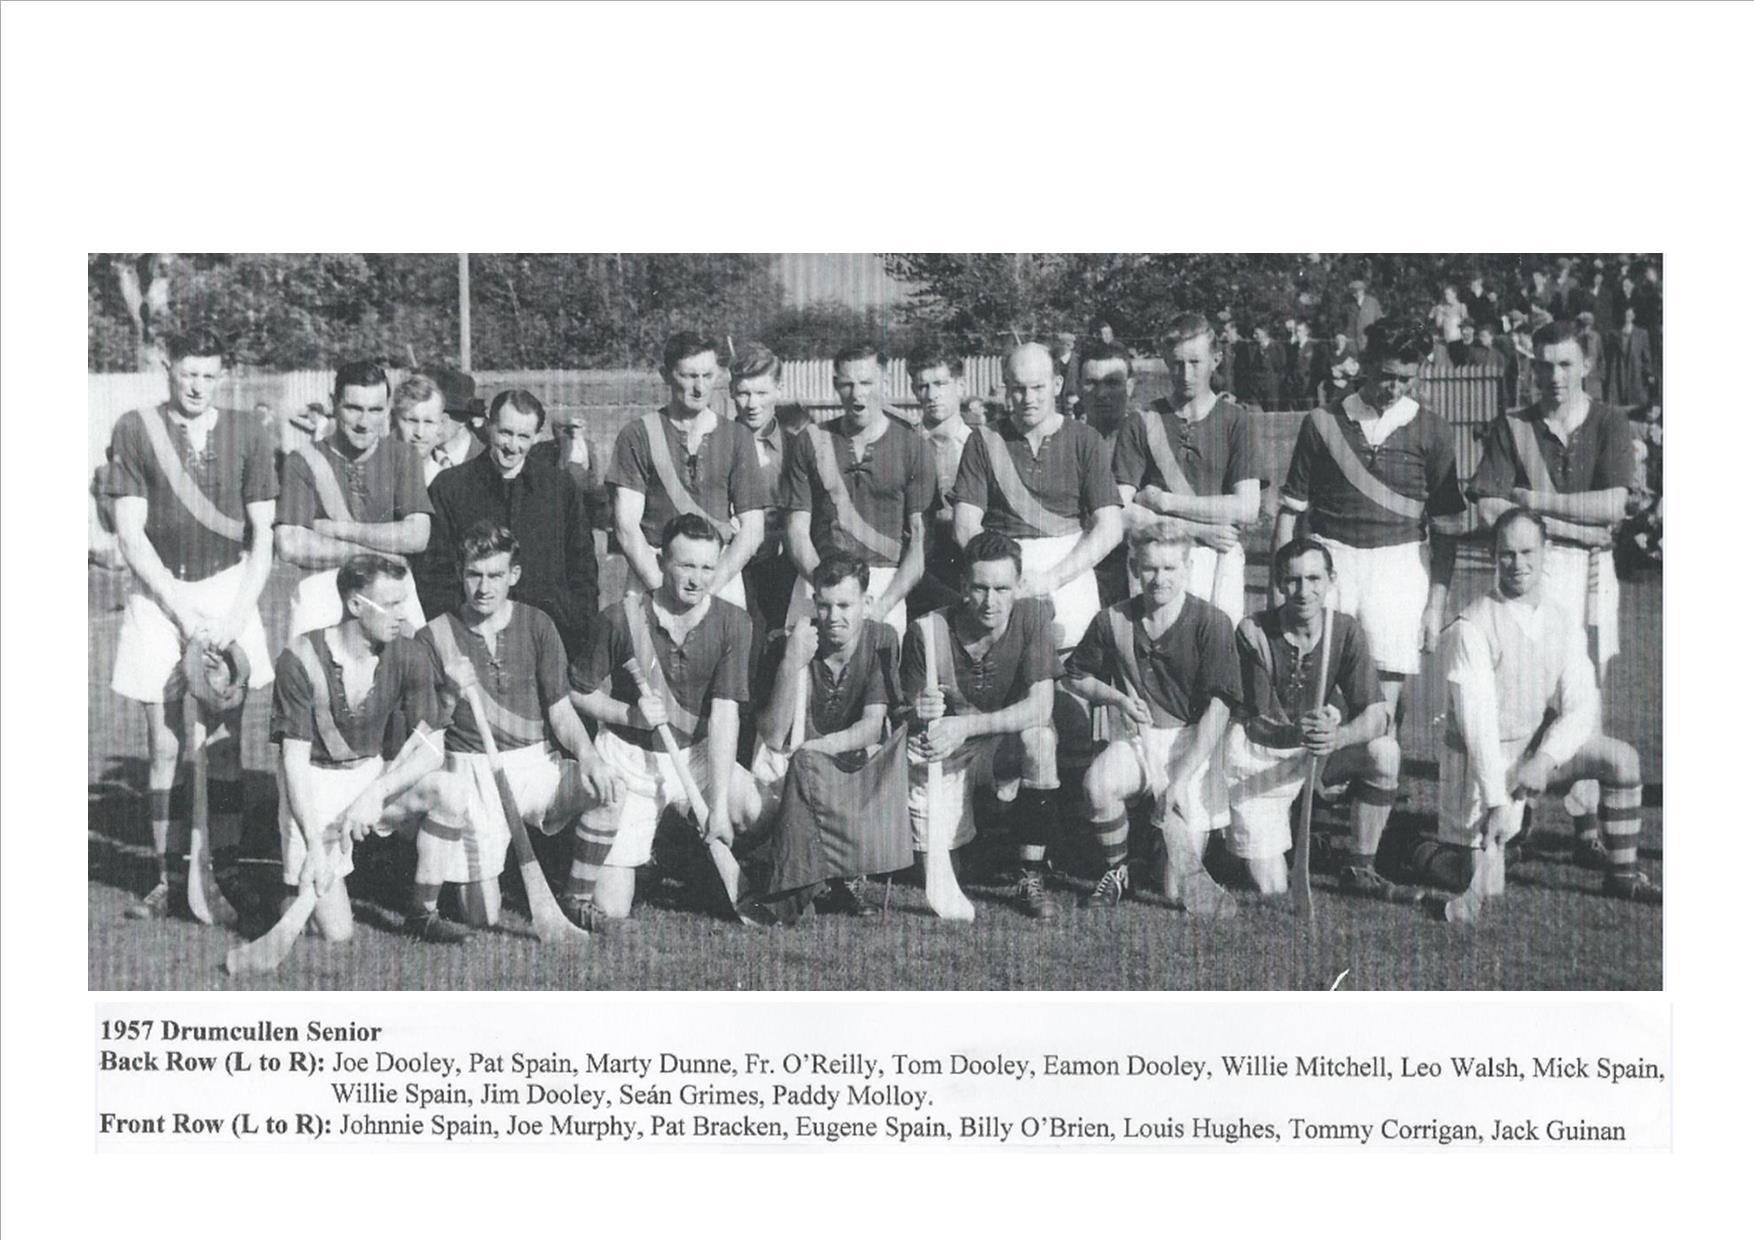 Drumcullen Senior Team - 1957